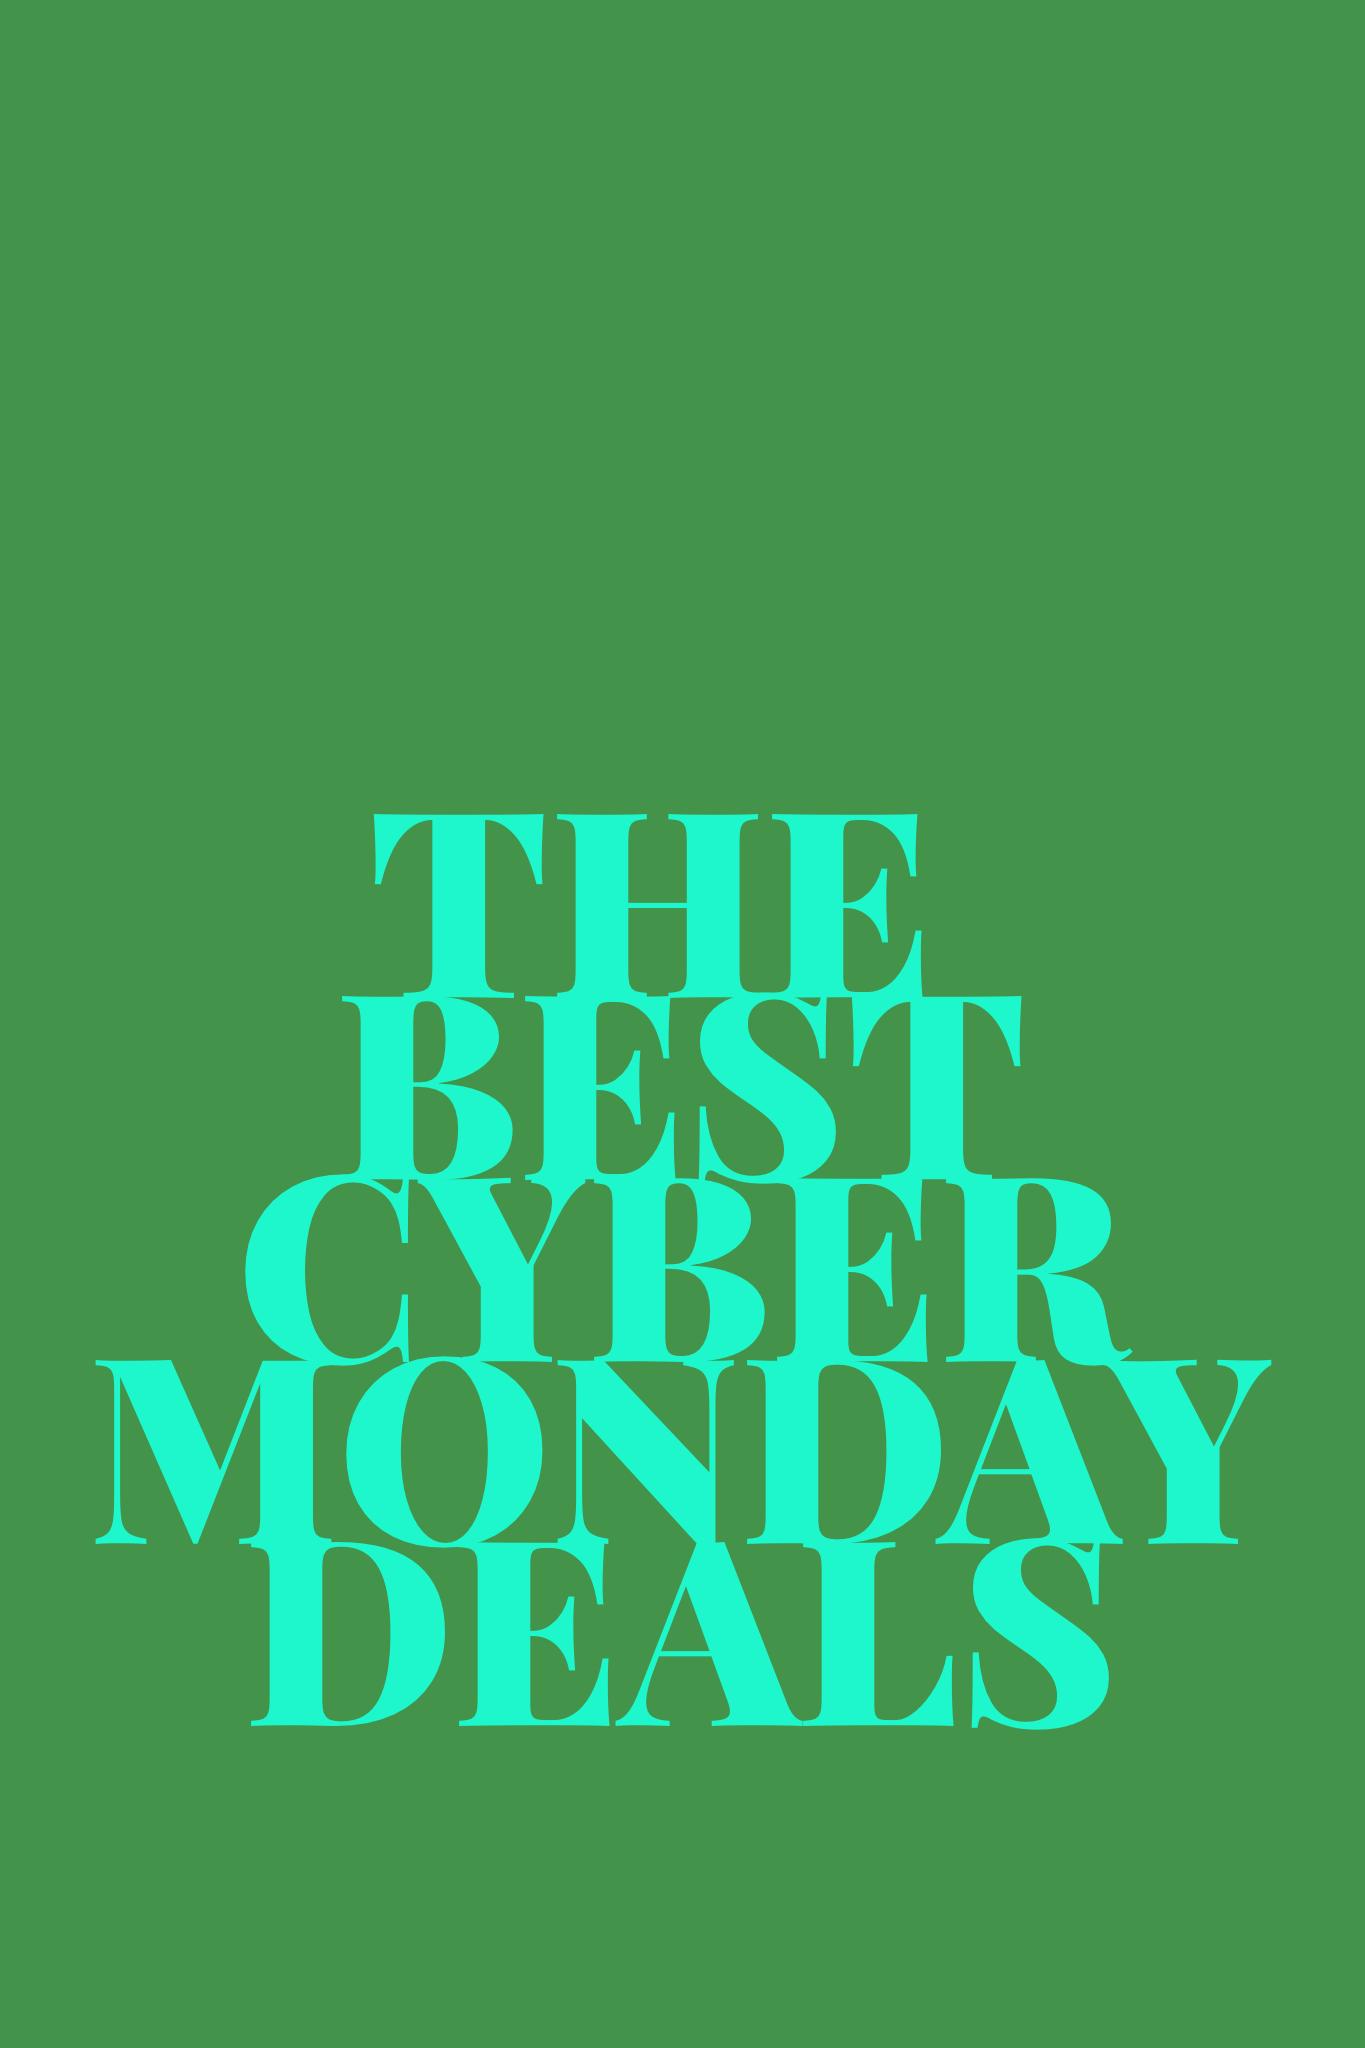 Best Cyber Monday deals